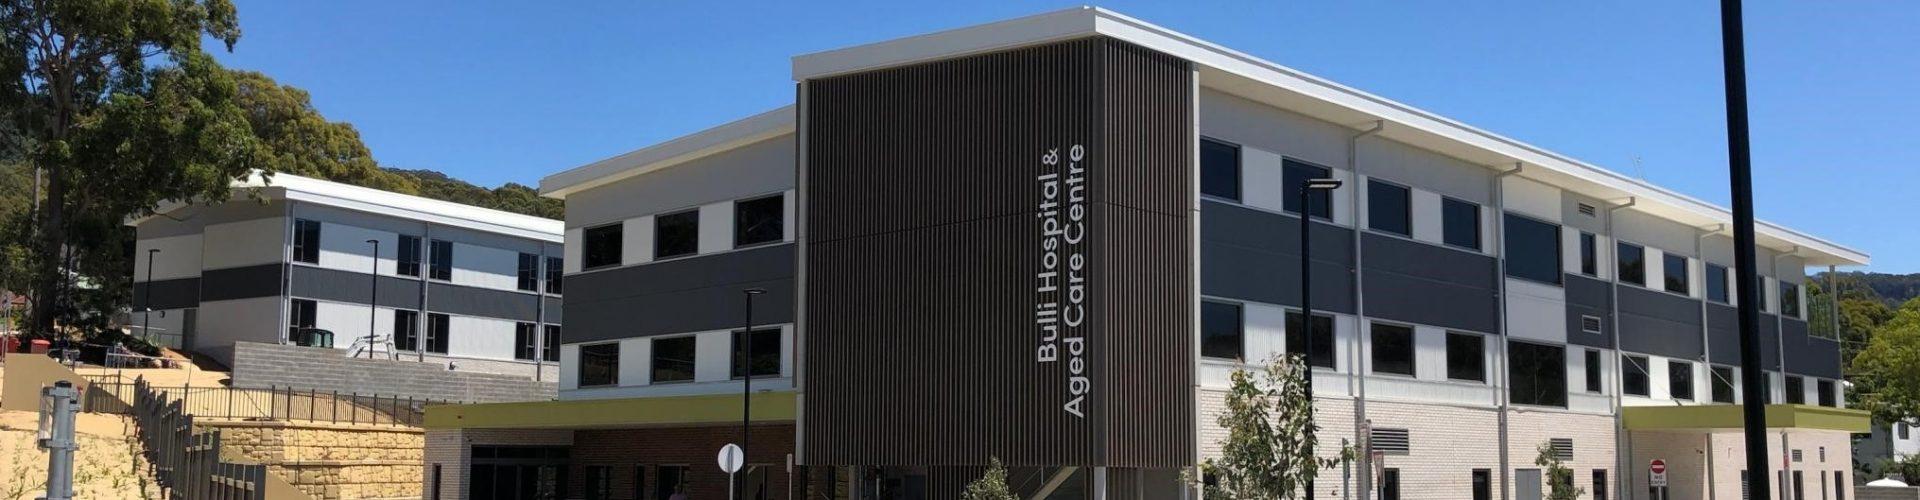 Bulli Hospital Exterior